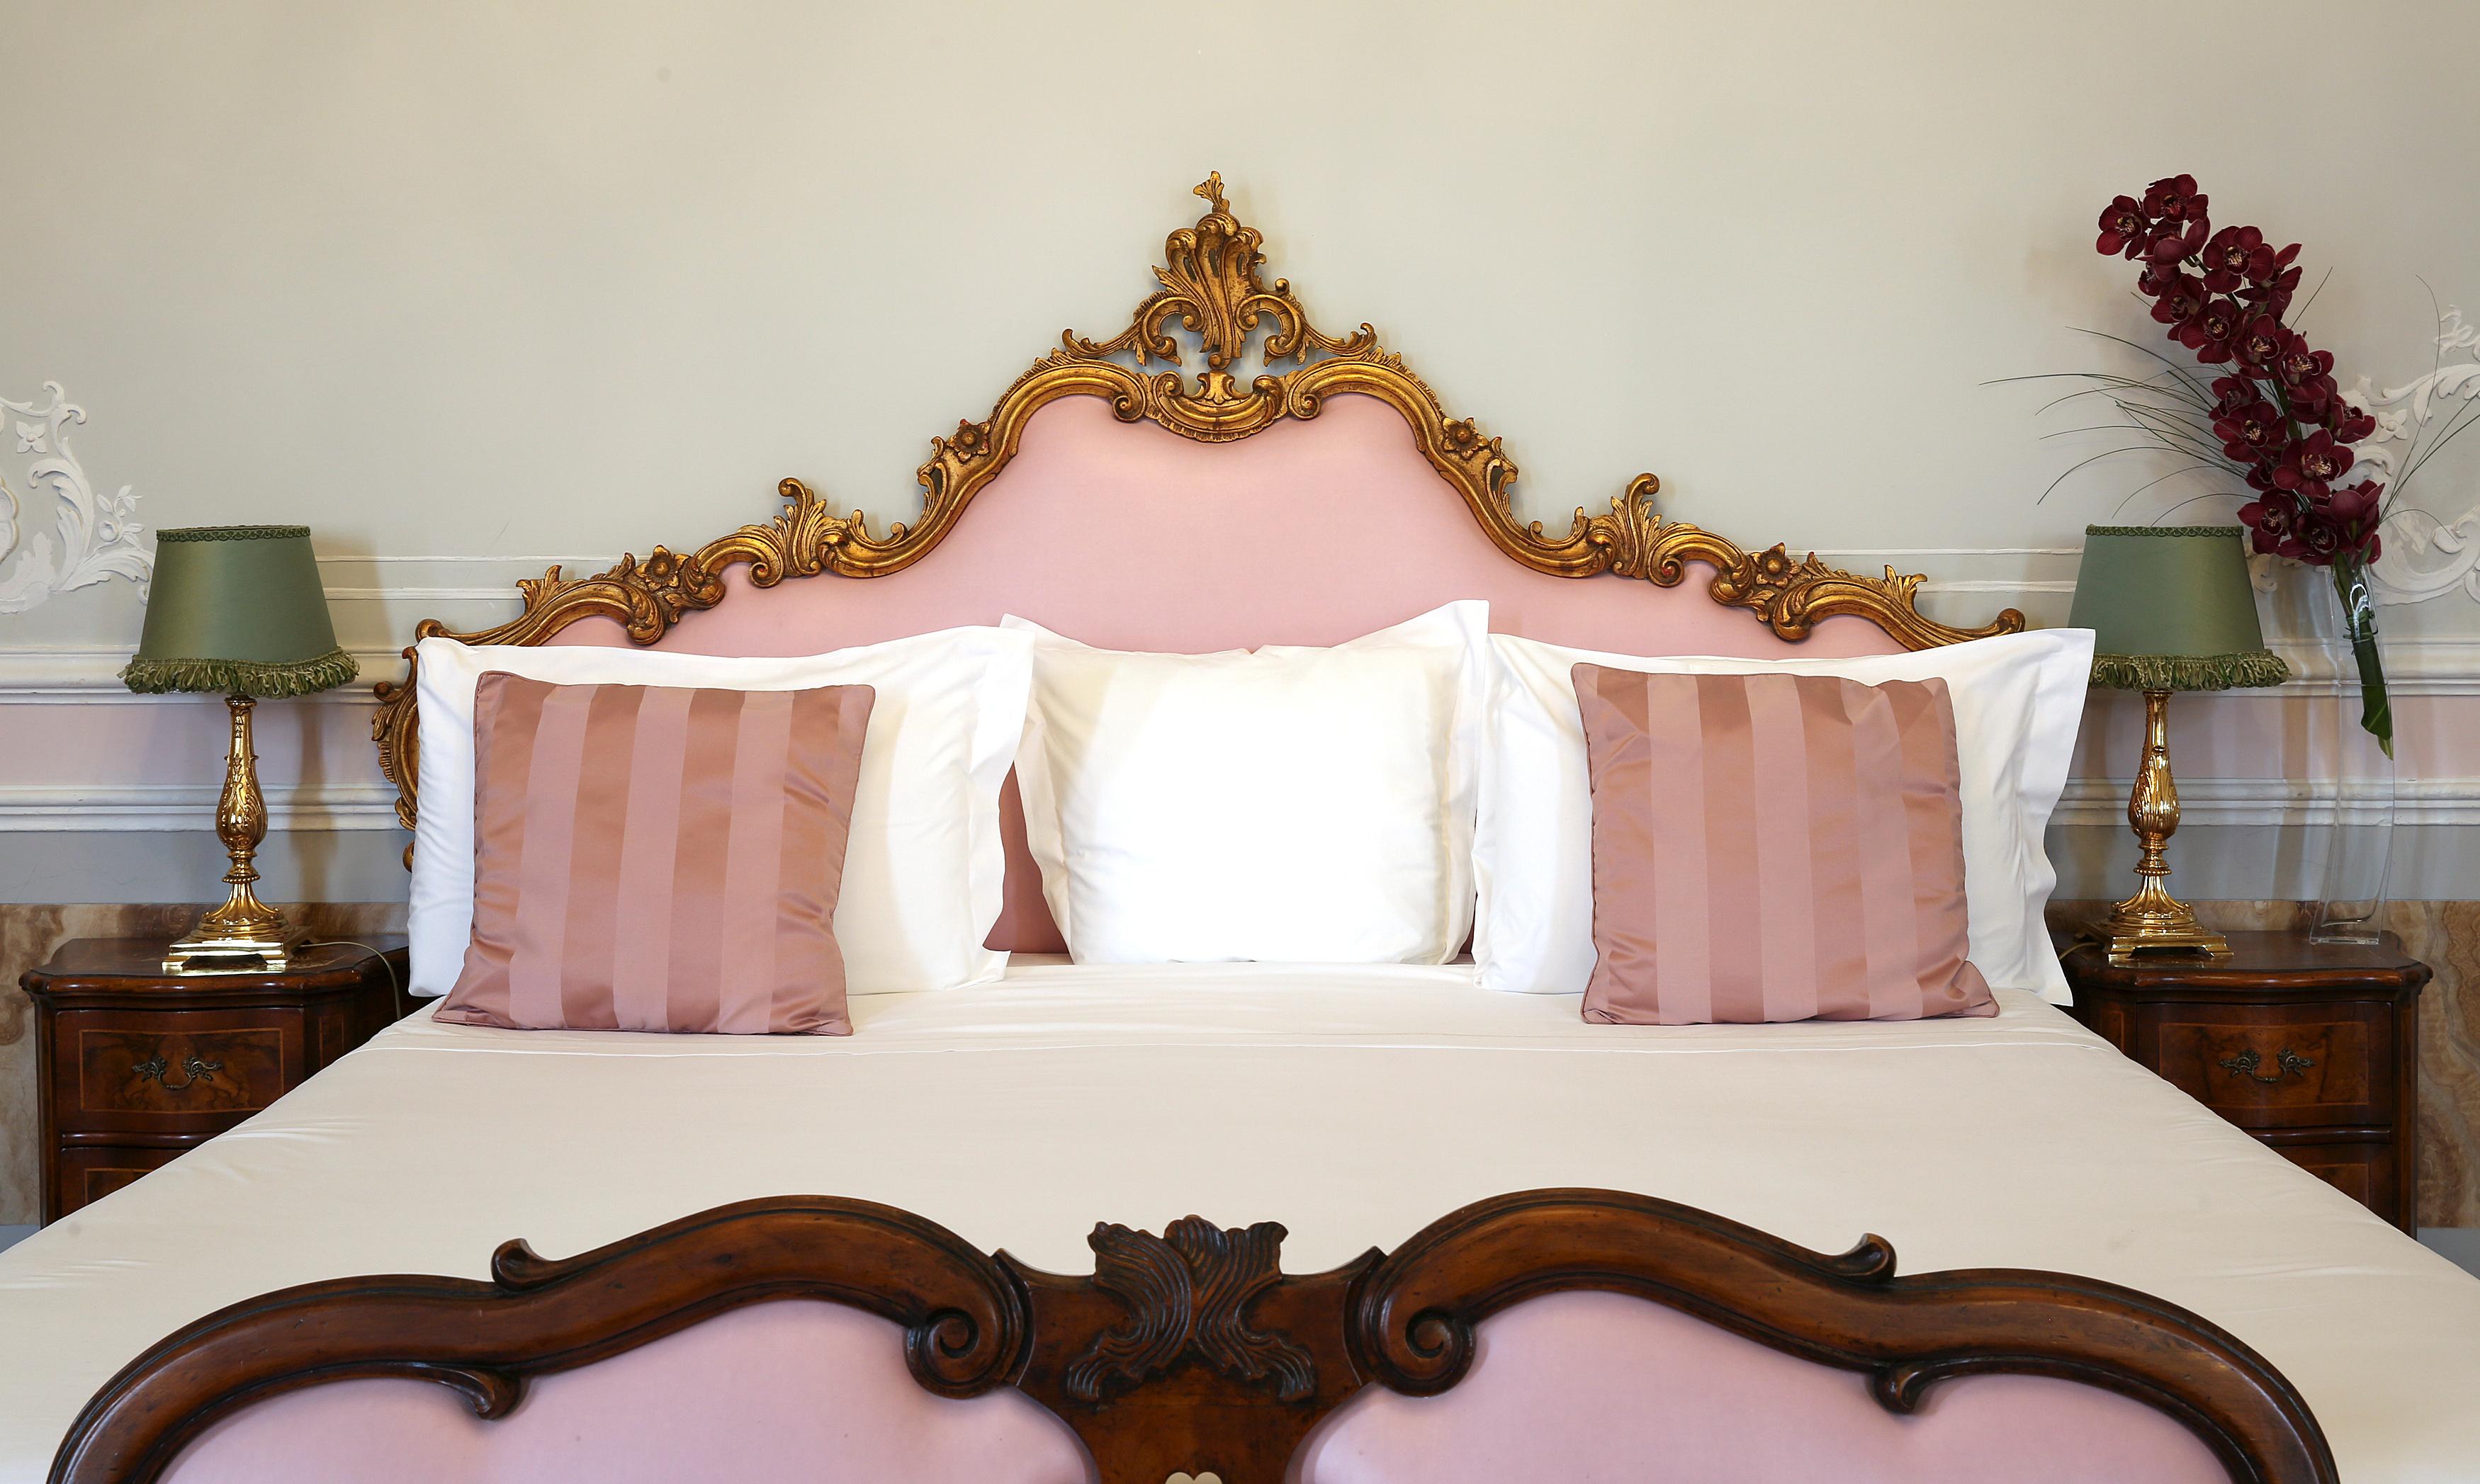 bed sex covid-19